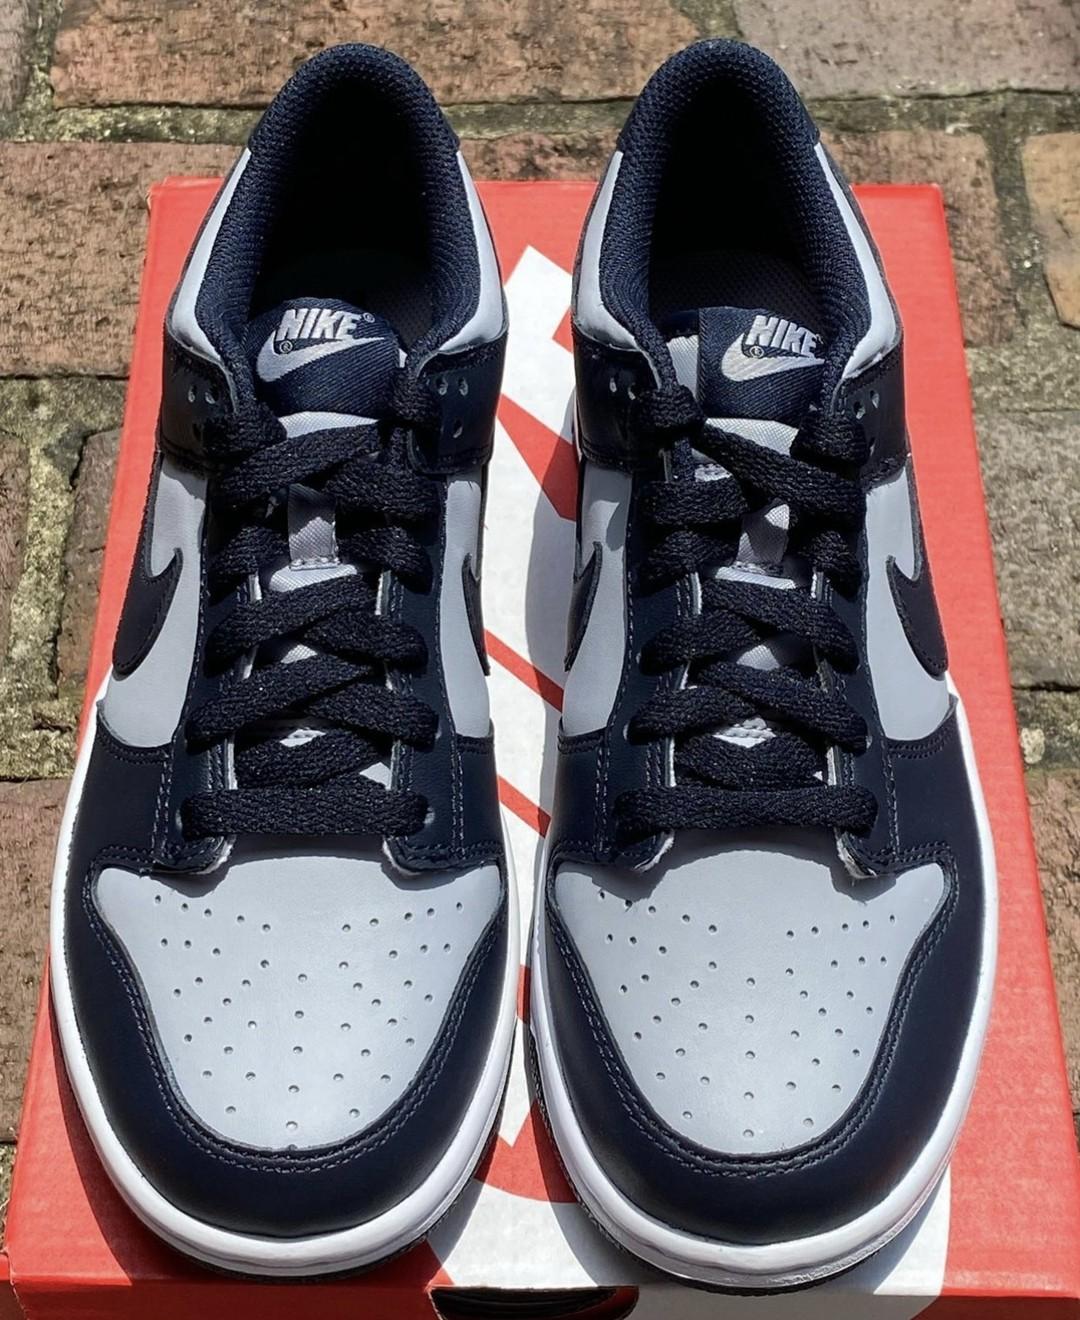 Nike,Dunk Low,Georgetown,CW159  简约又高级!「海军蓝」Dunk Low 实物曝光!